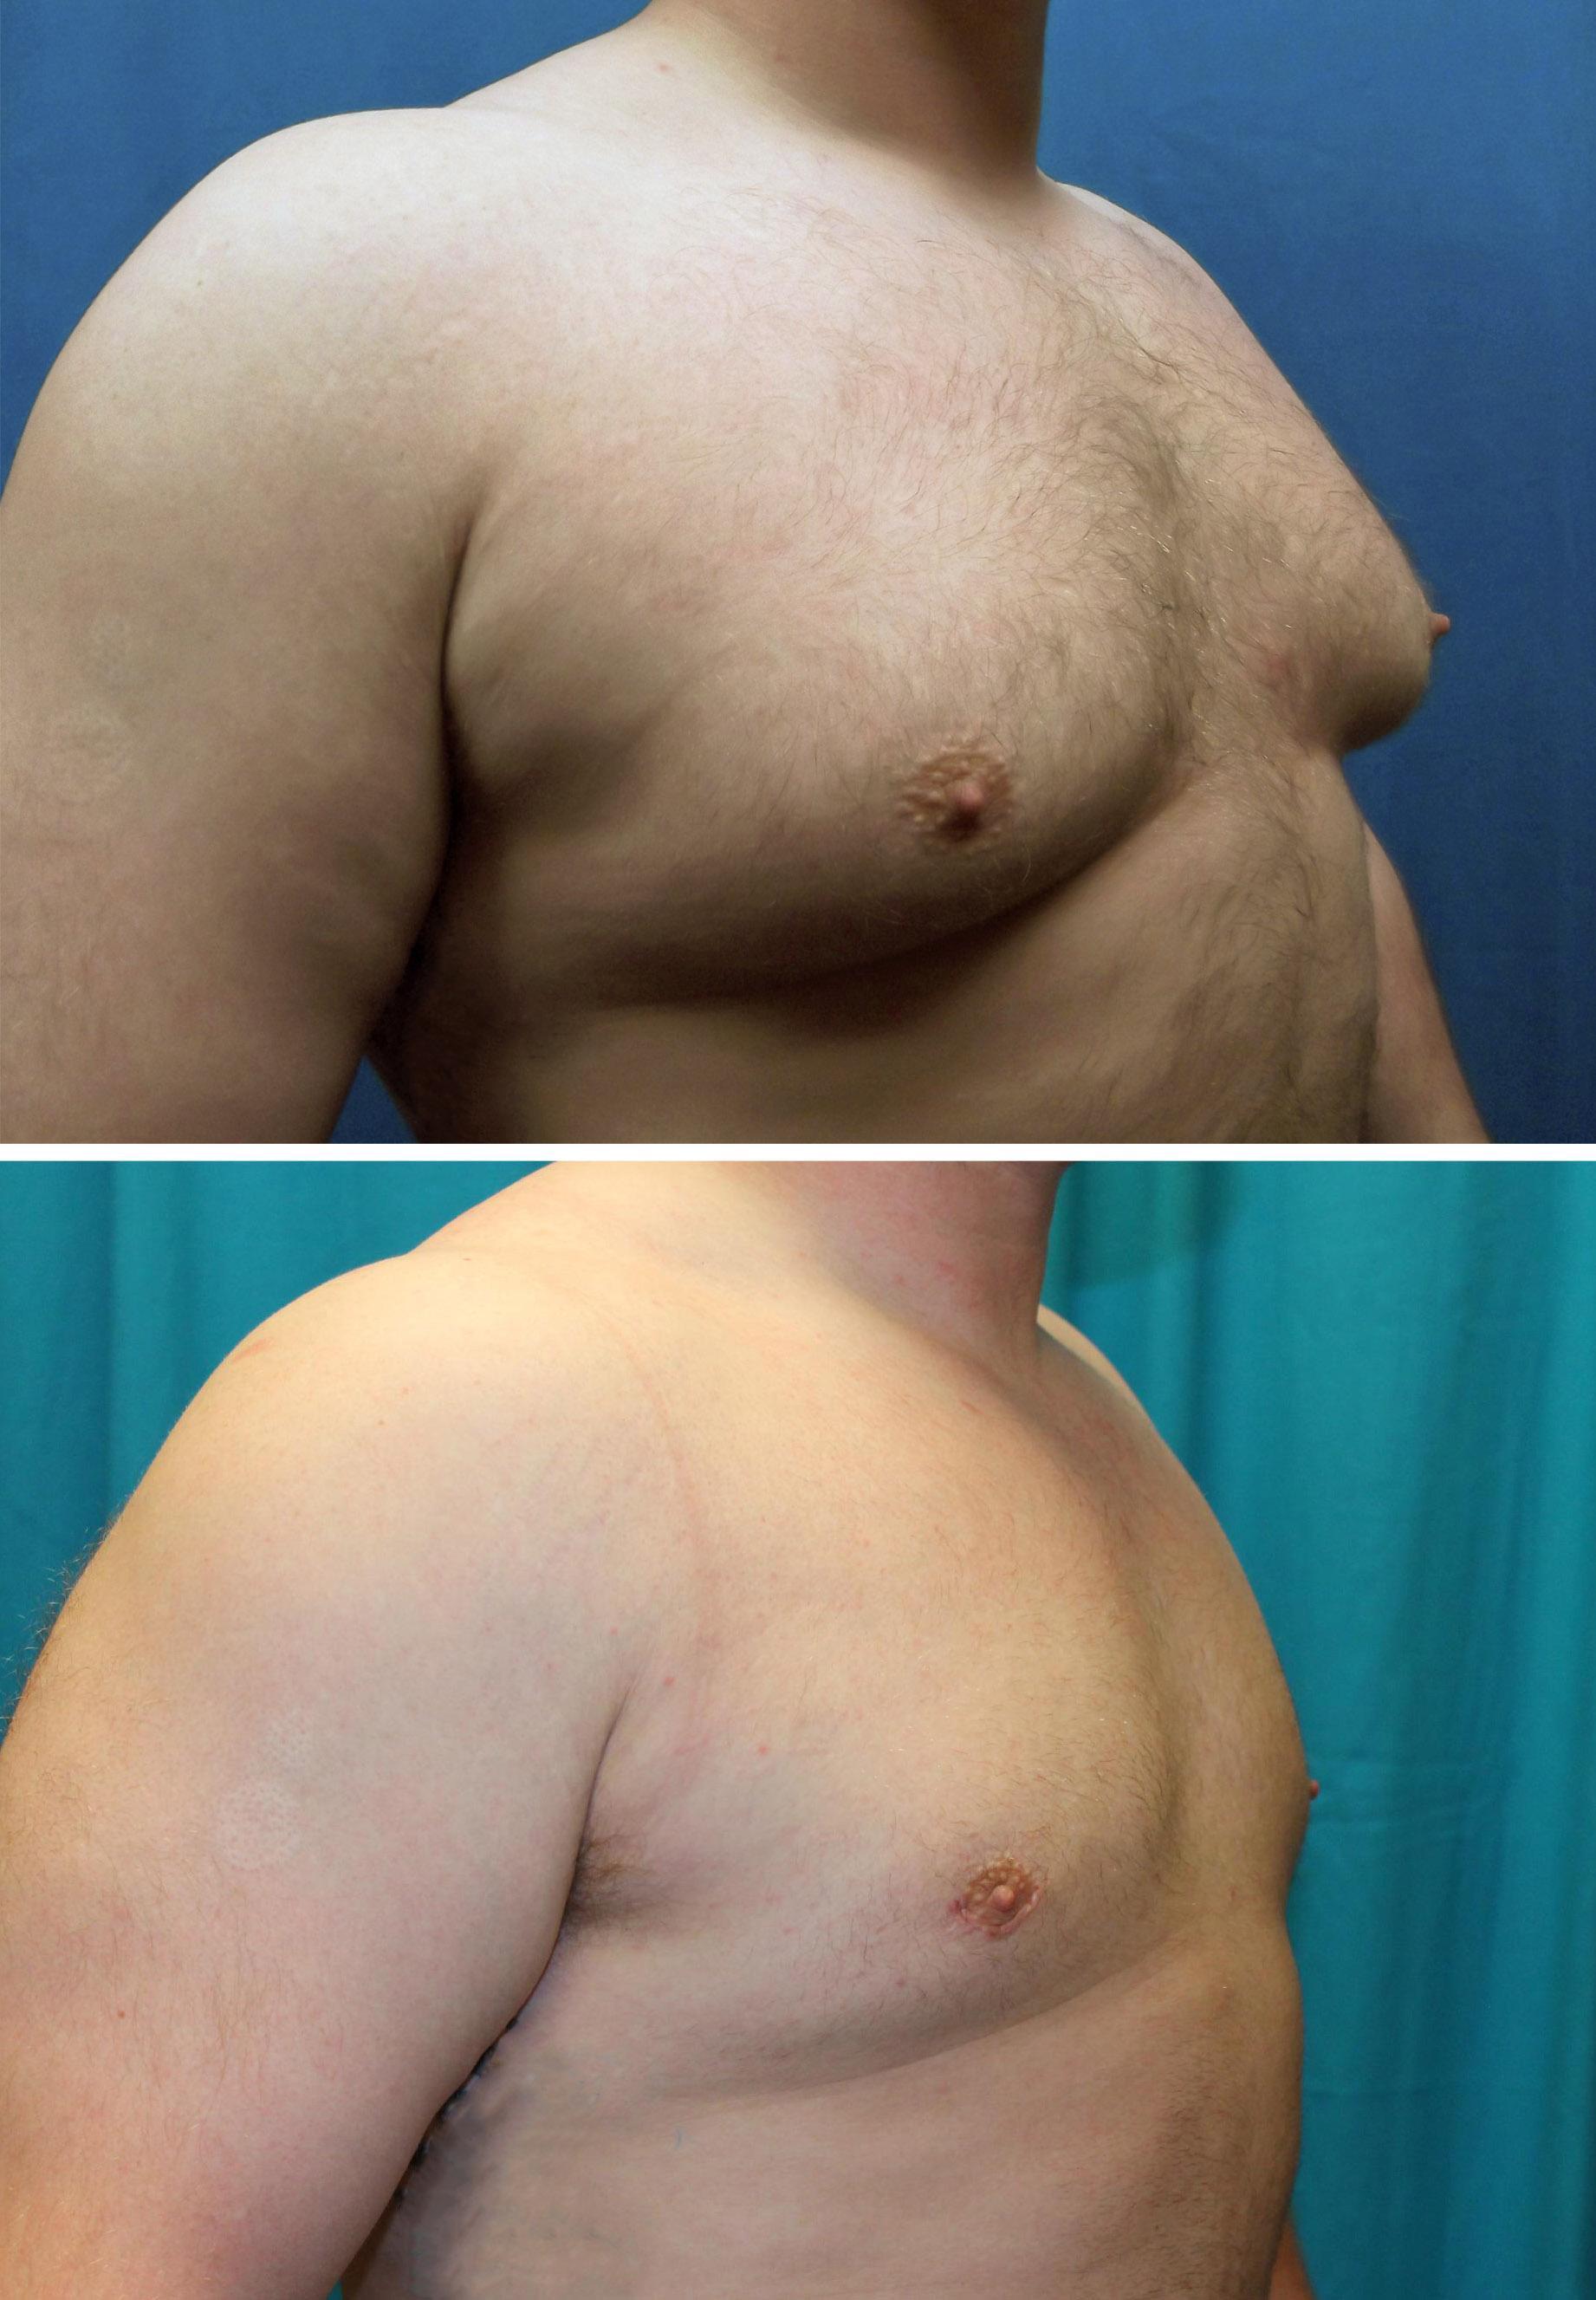 Severe male breast enlargement